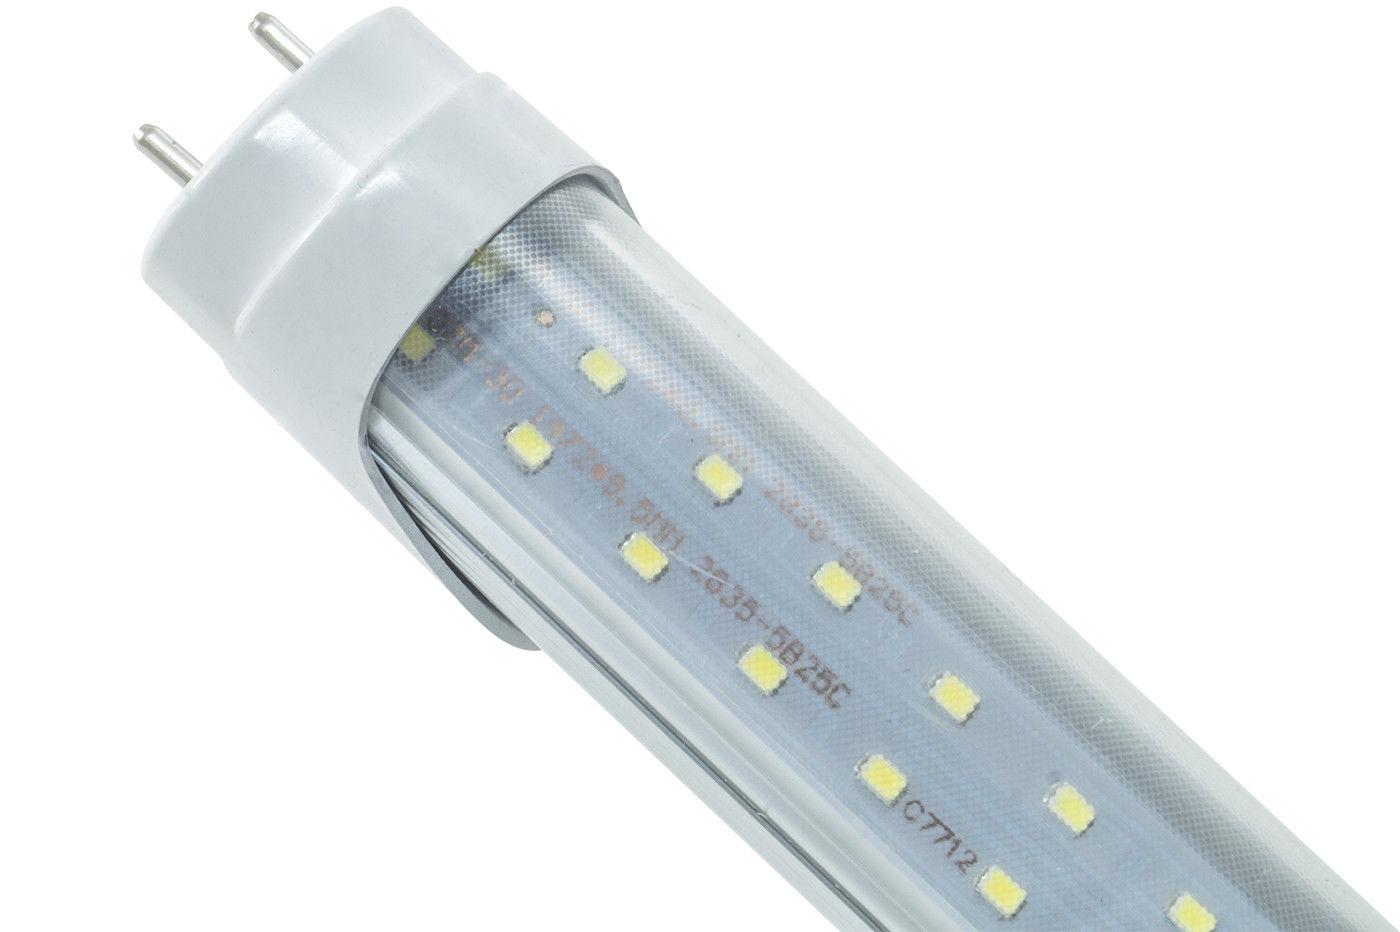 Plafoniera Tubo Led 60 Cm : Bes tubi led beselettronica neon luce fredda w watt